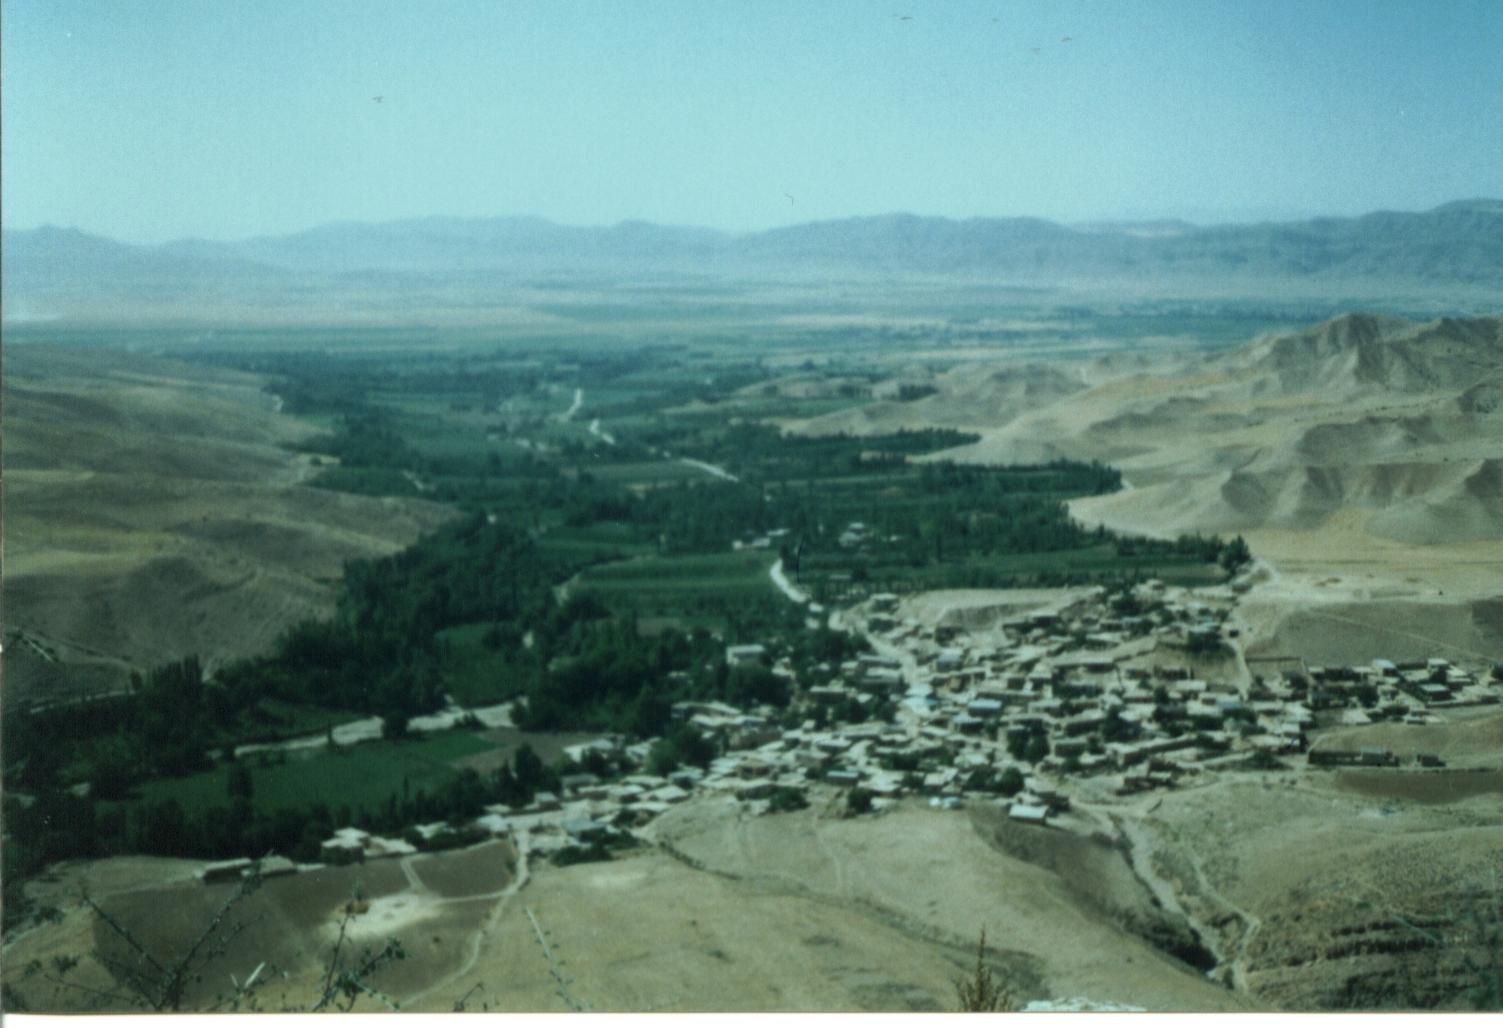 شیرآباد (خراسان شمالی)